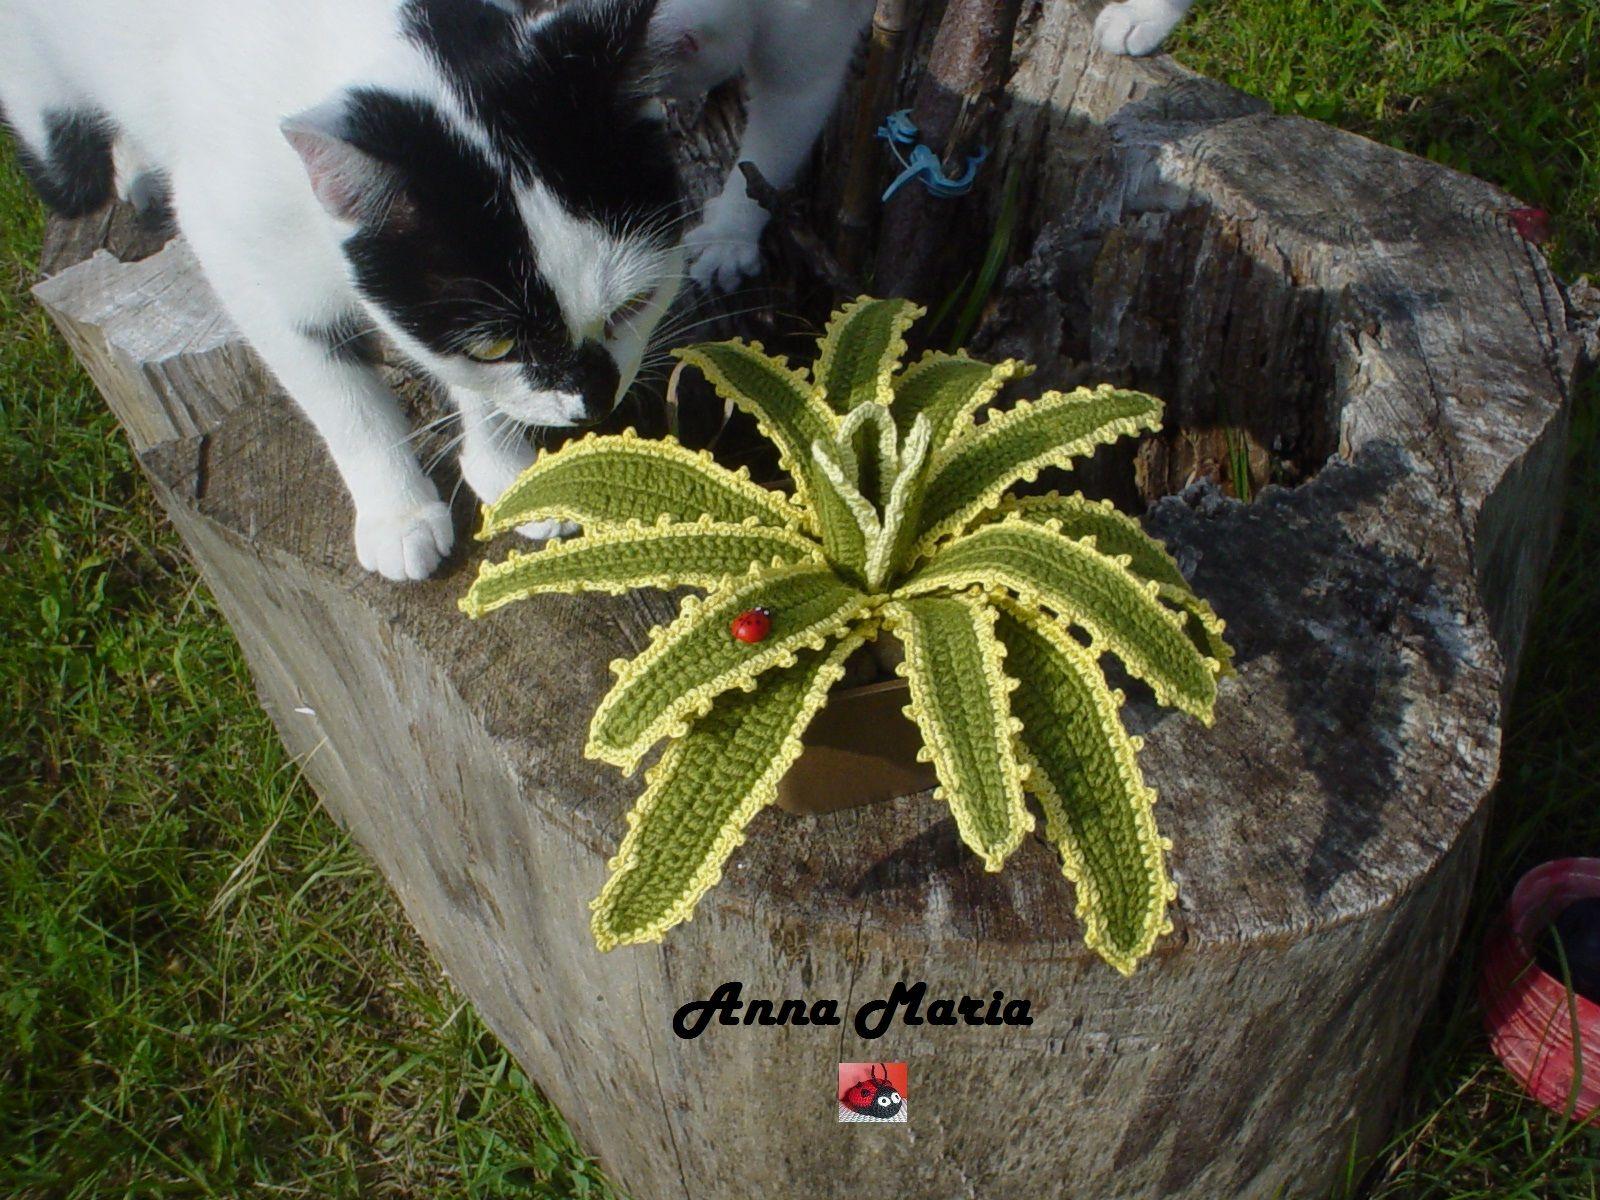 Piante grasse agave uncinetto amigurumi plants for Piante grasse uncinetto